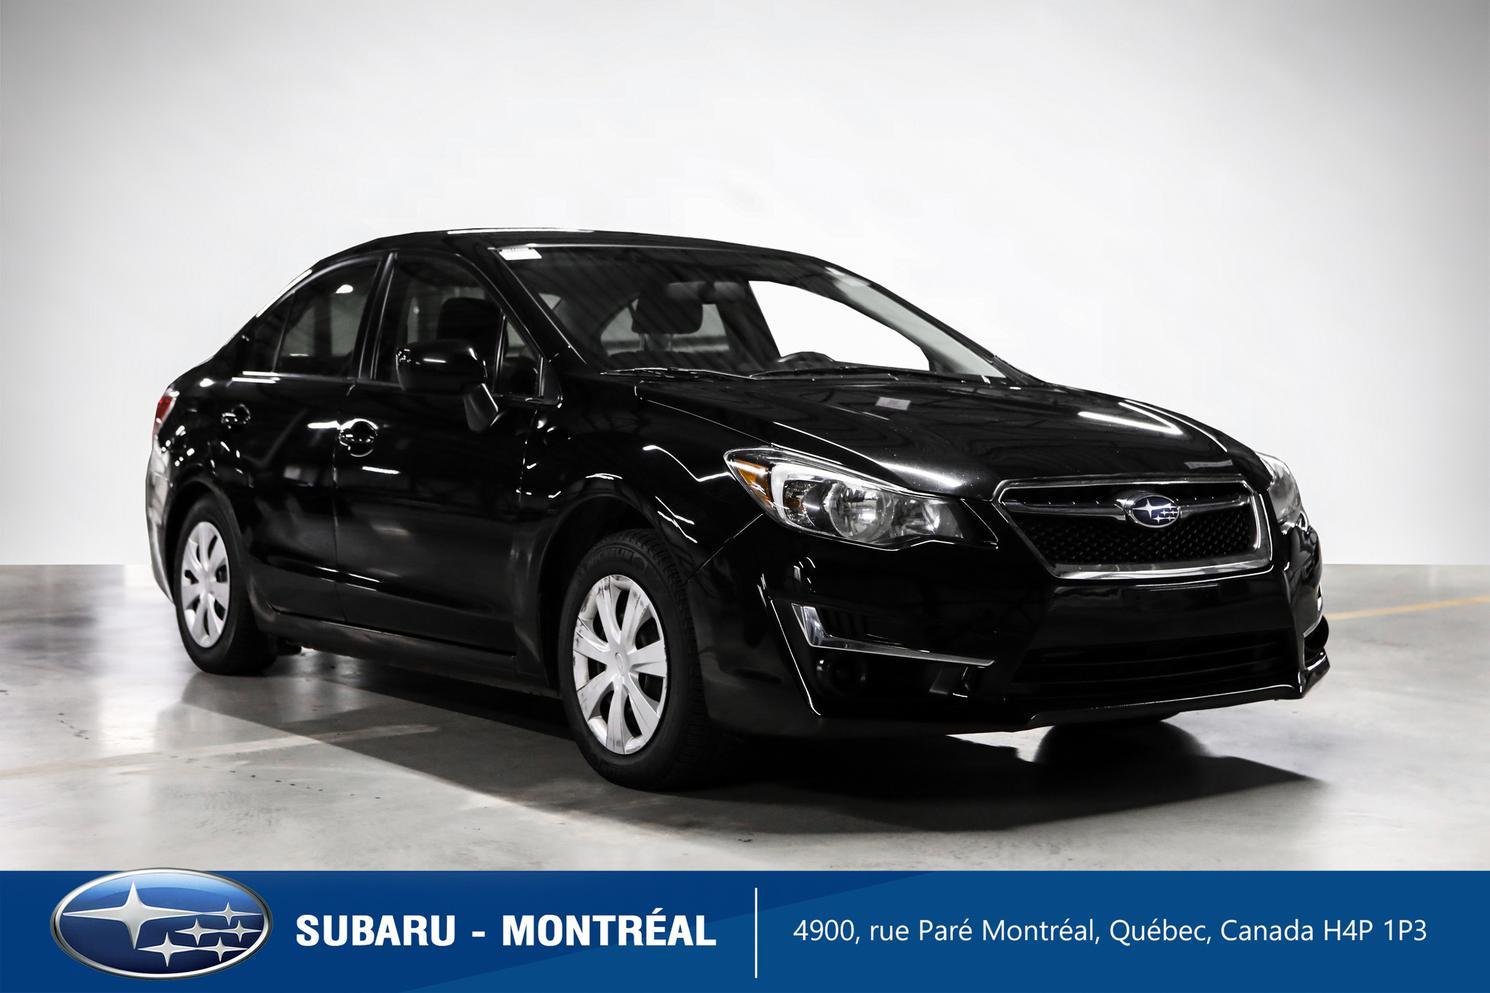 2015 Subaru Impreza Convenience